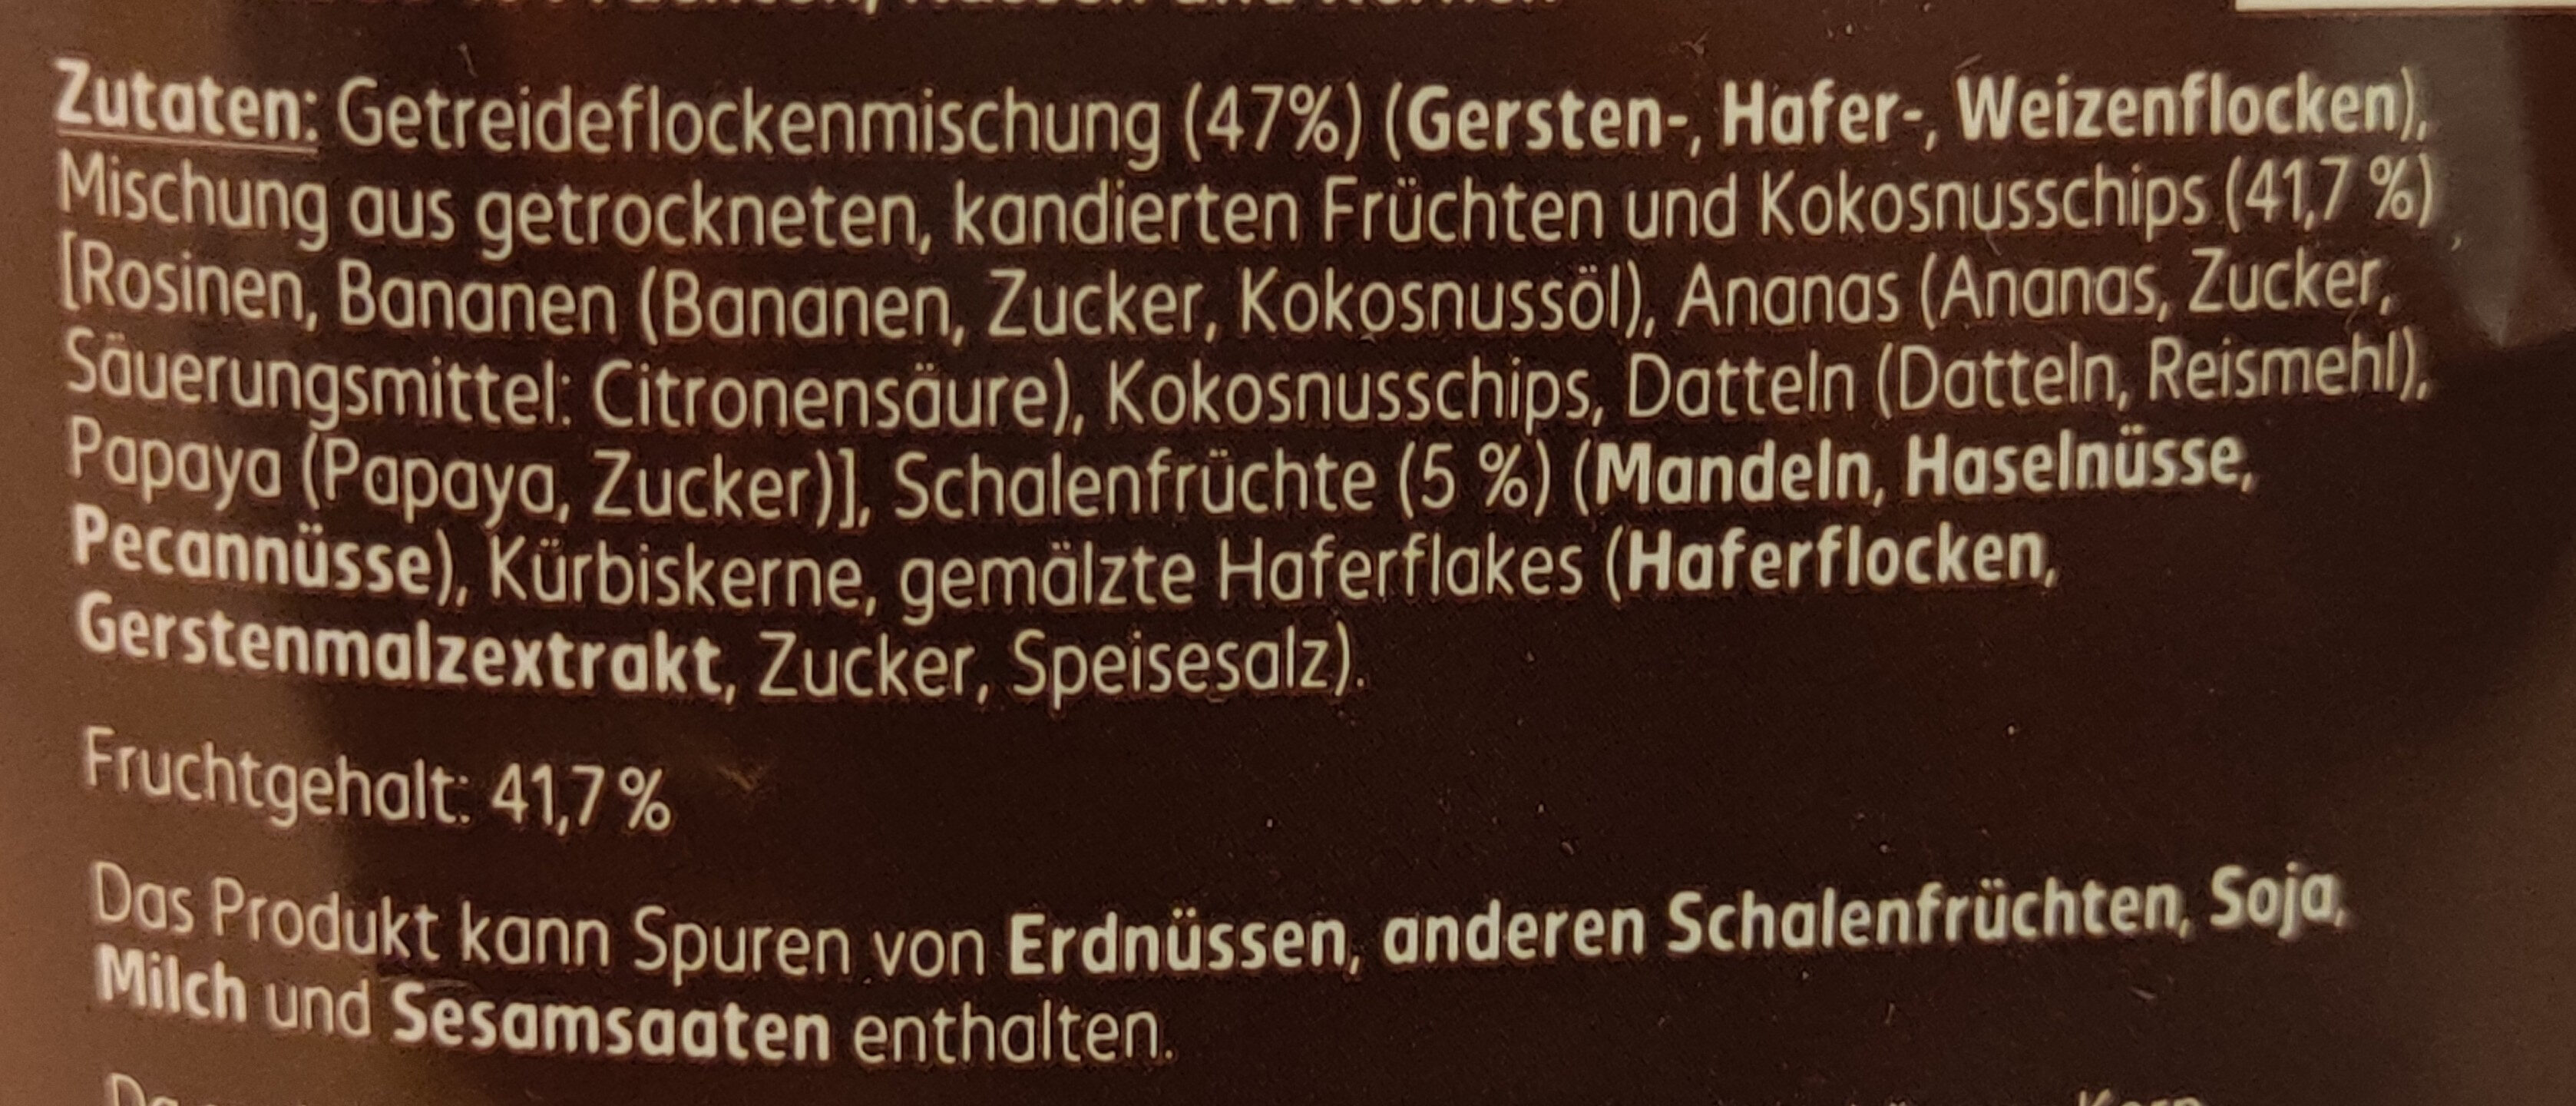 Gourmet Müsli Früchte & Nüsse - Ingredients - de